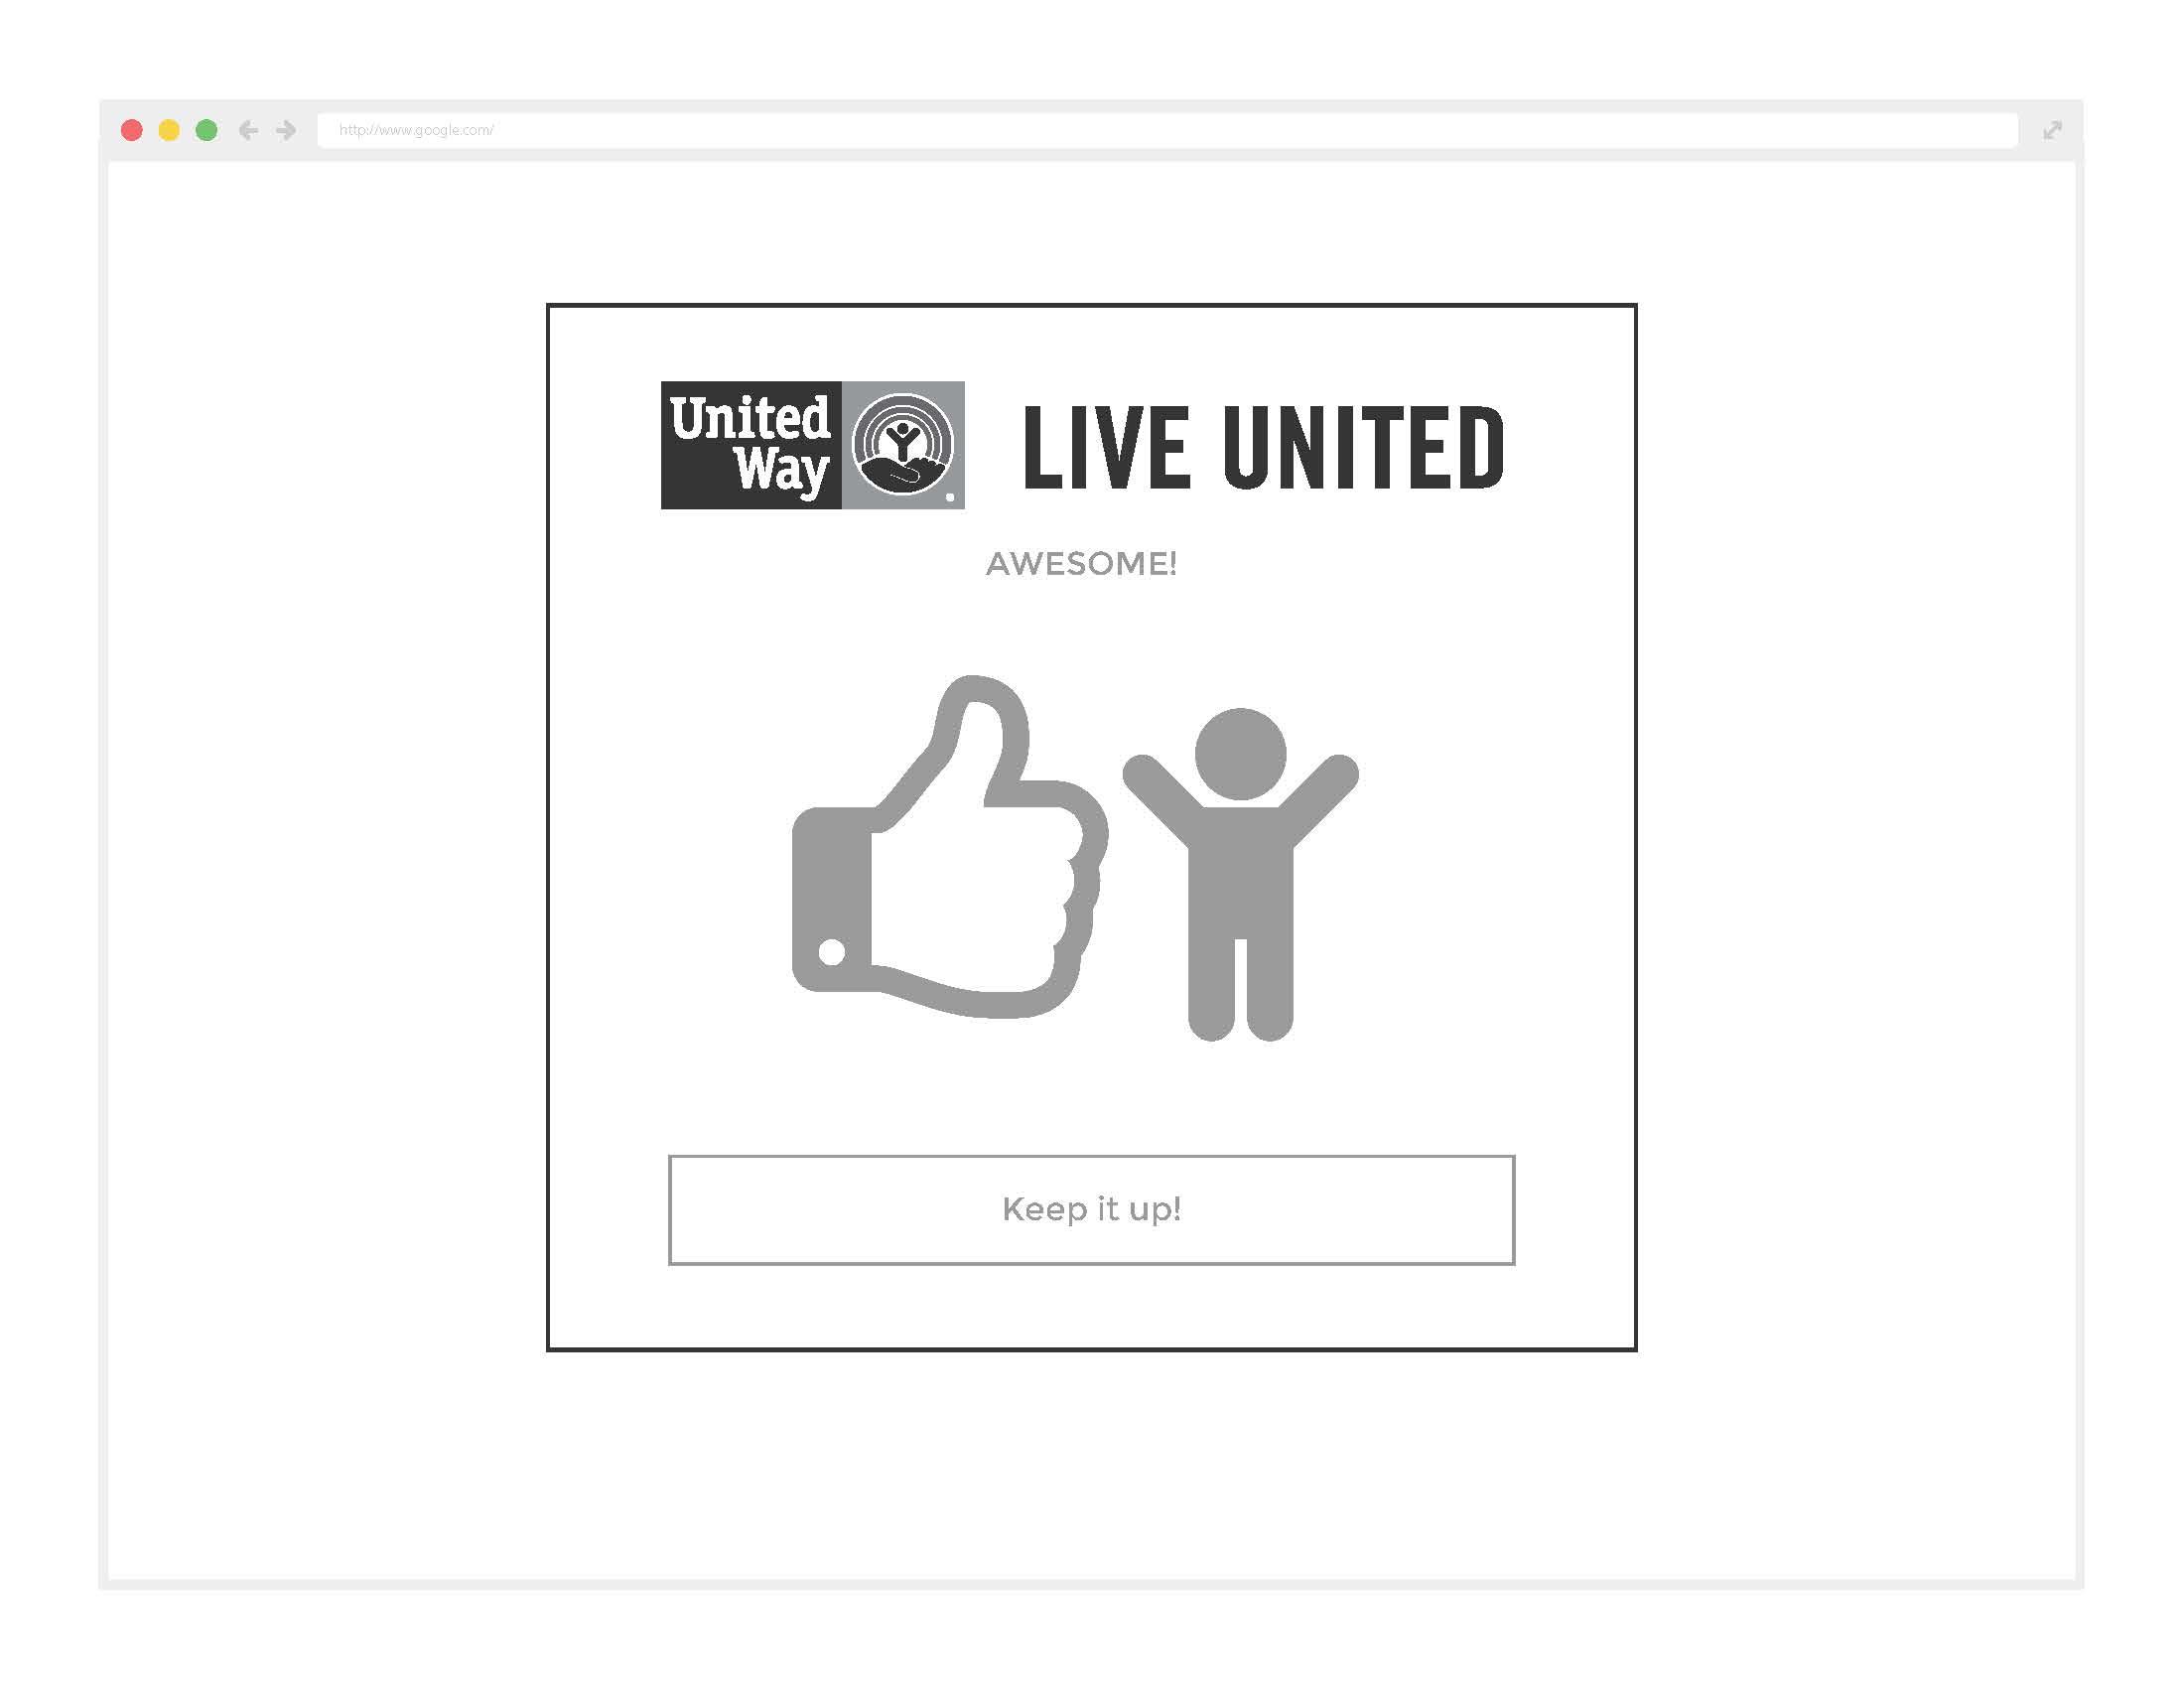 unitedway_Page_7.jpg